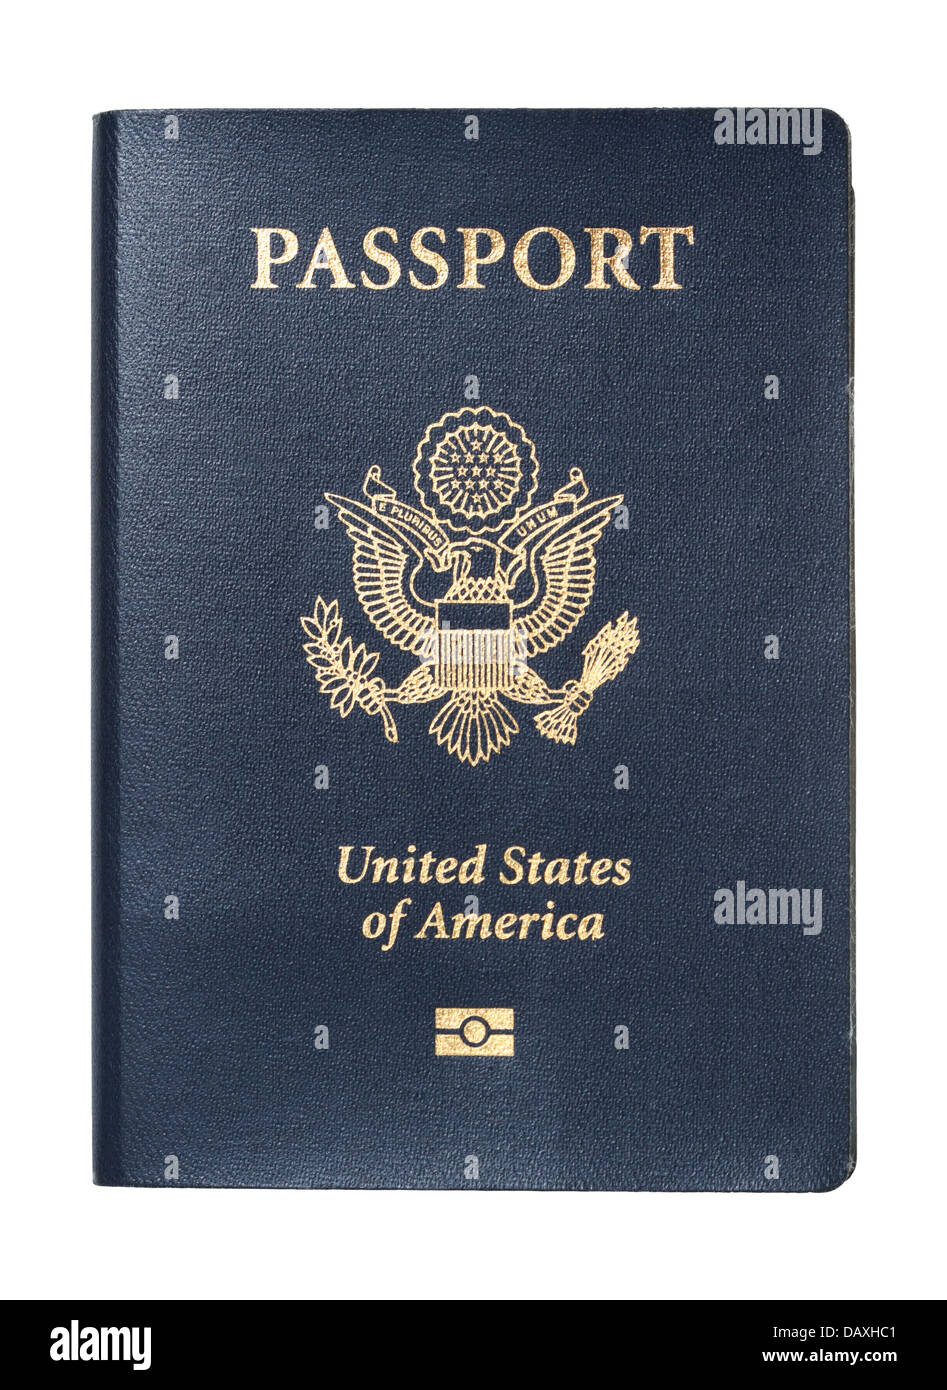 Passport of United States of America - Stock Image